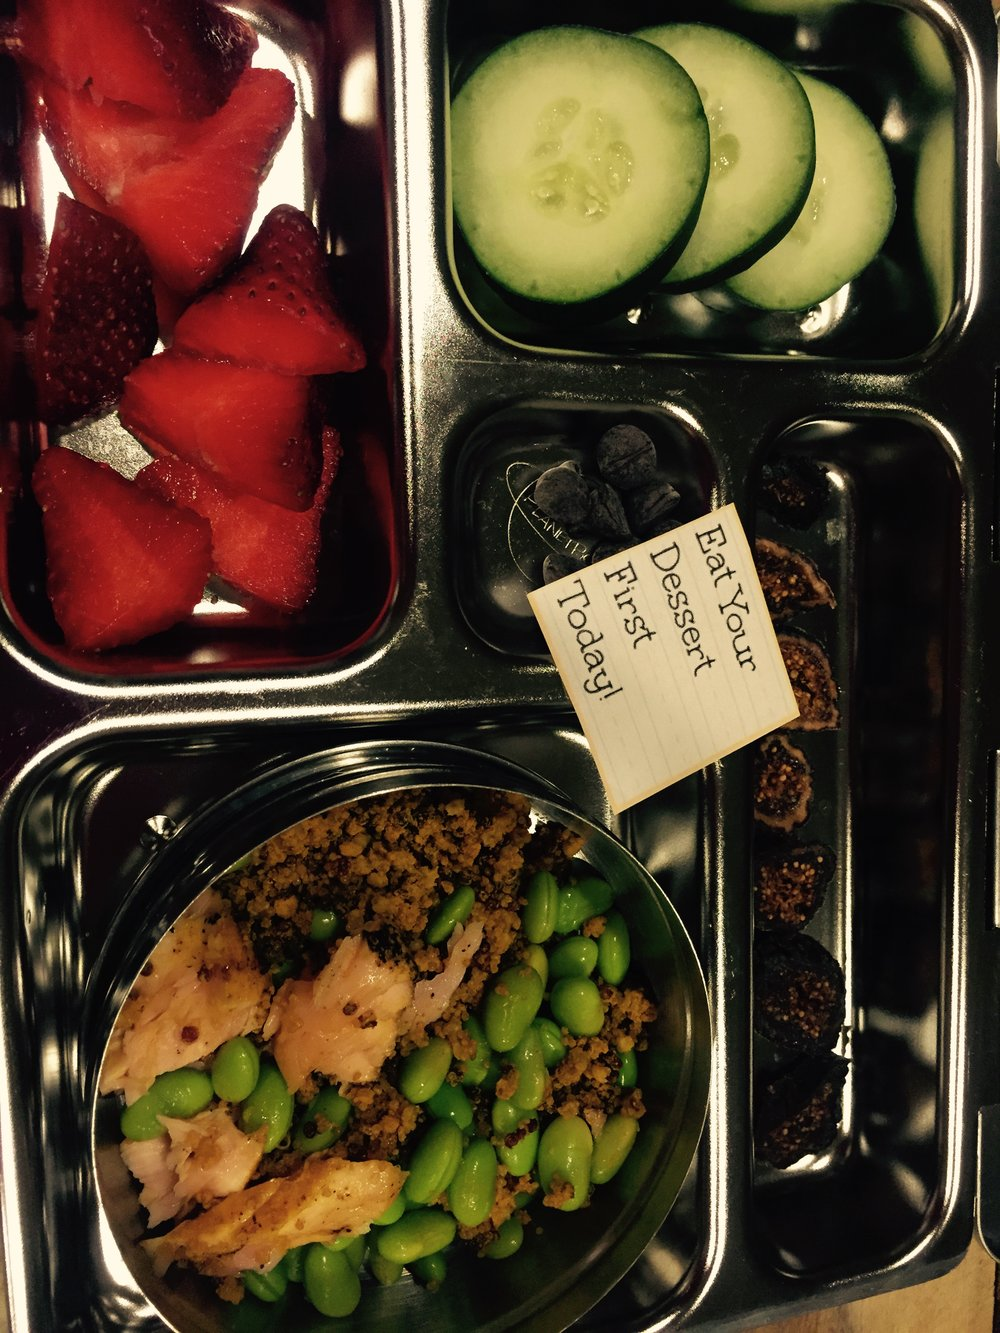 - leftover honey salmon + edamame + quinoa, dried figs (sliced), strawberries + sliced cucumbers